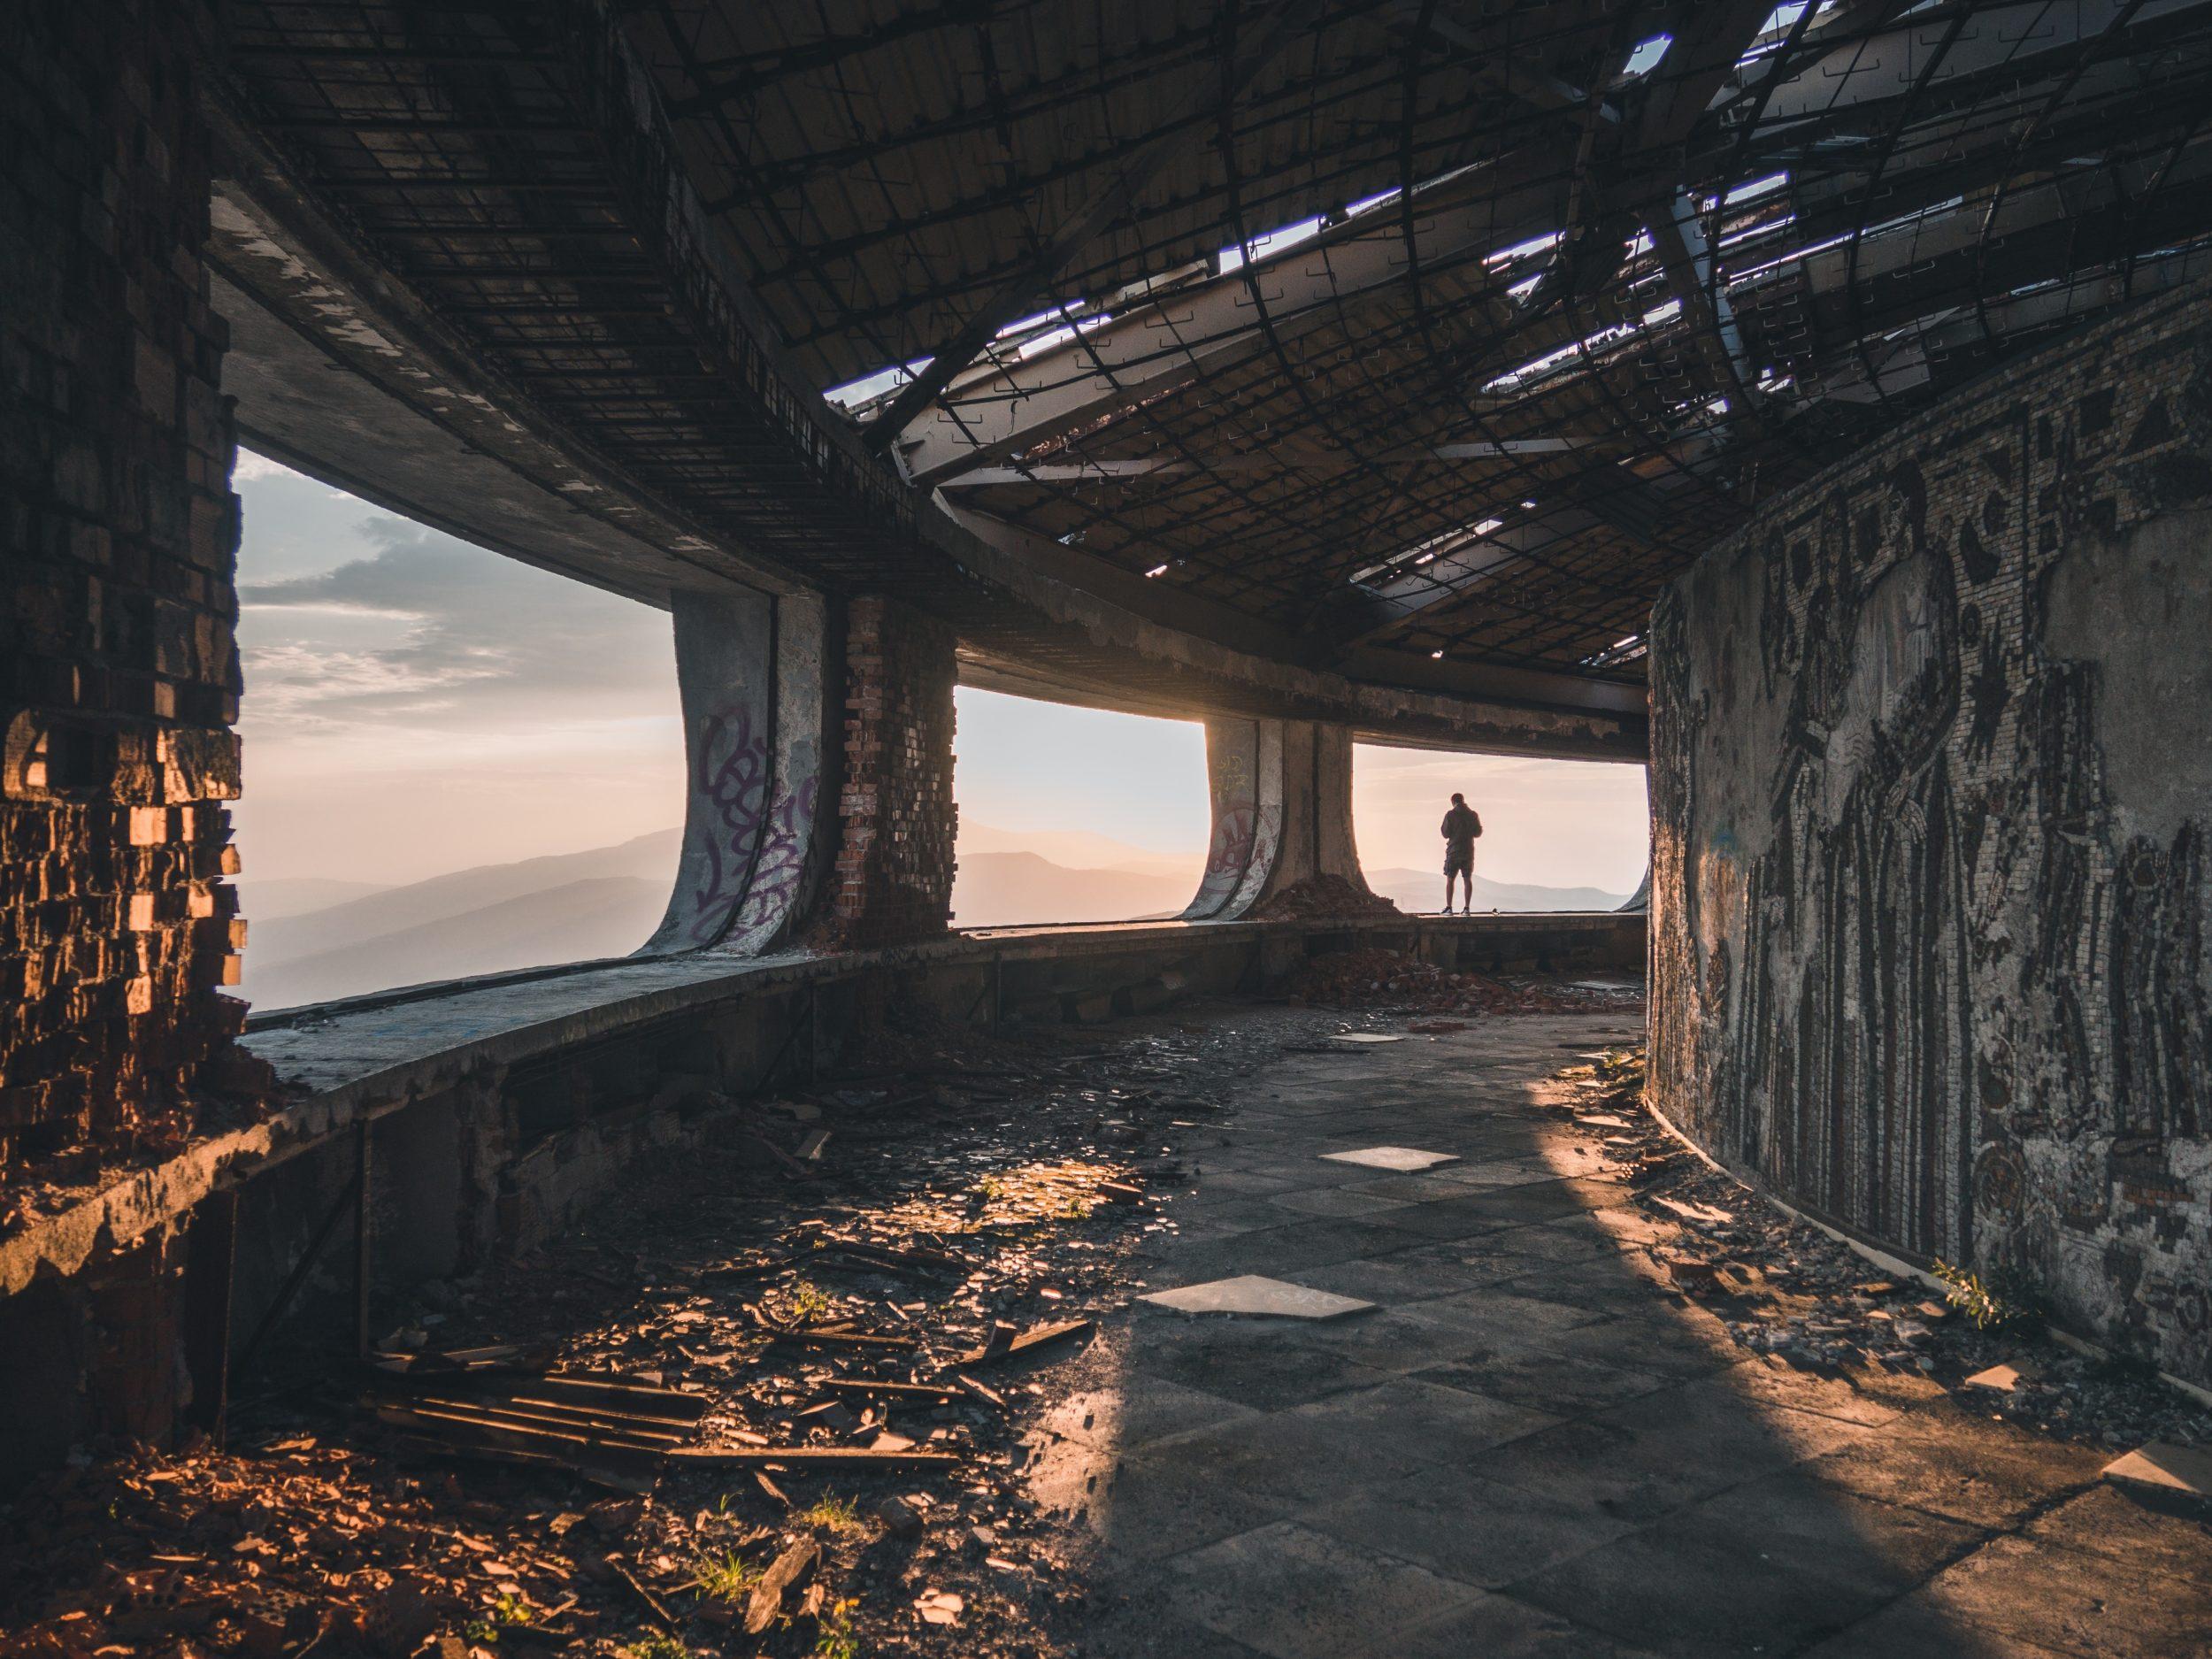 The abandoned Soviet sculpture at Buzludzha Peak, Bulgaria (Photo by Natalya Letunova)